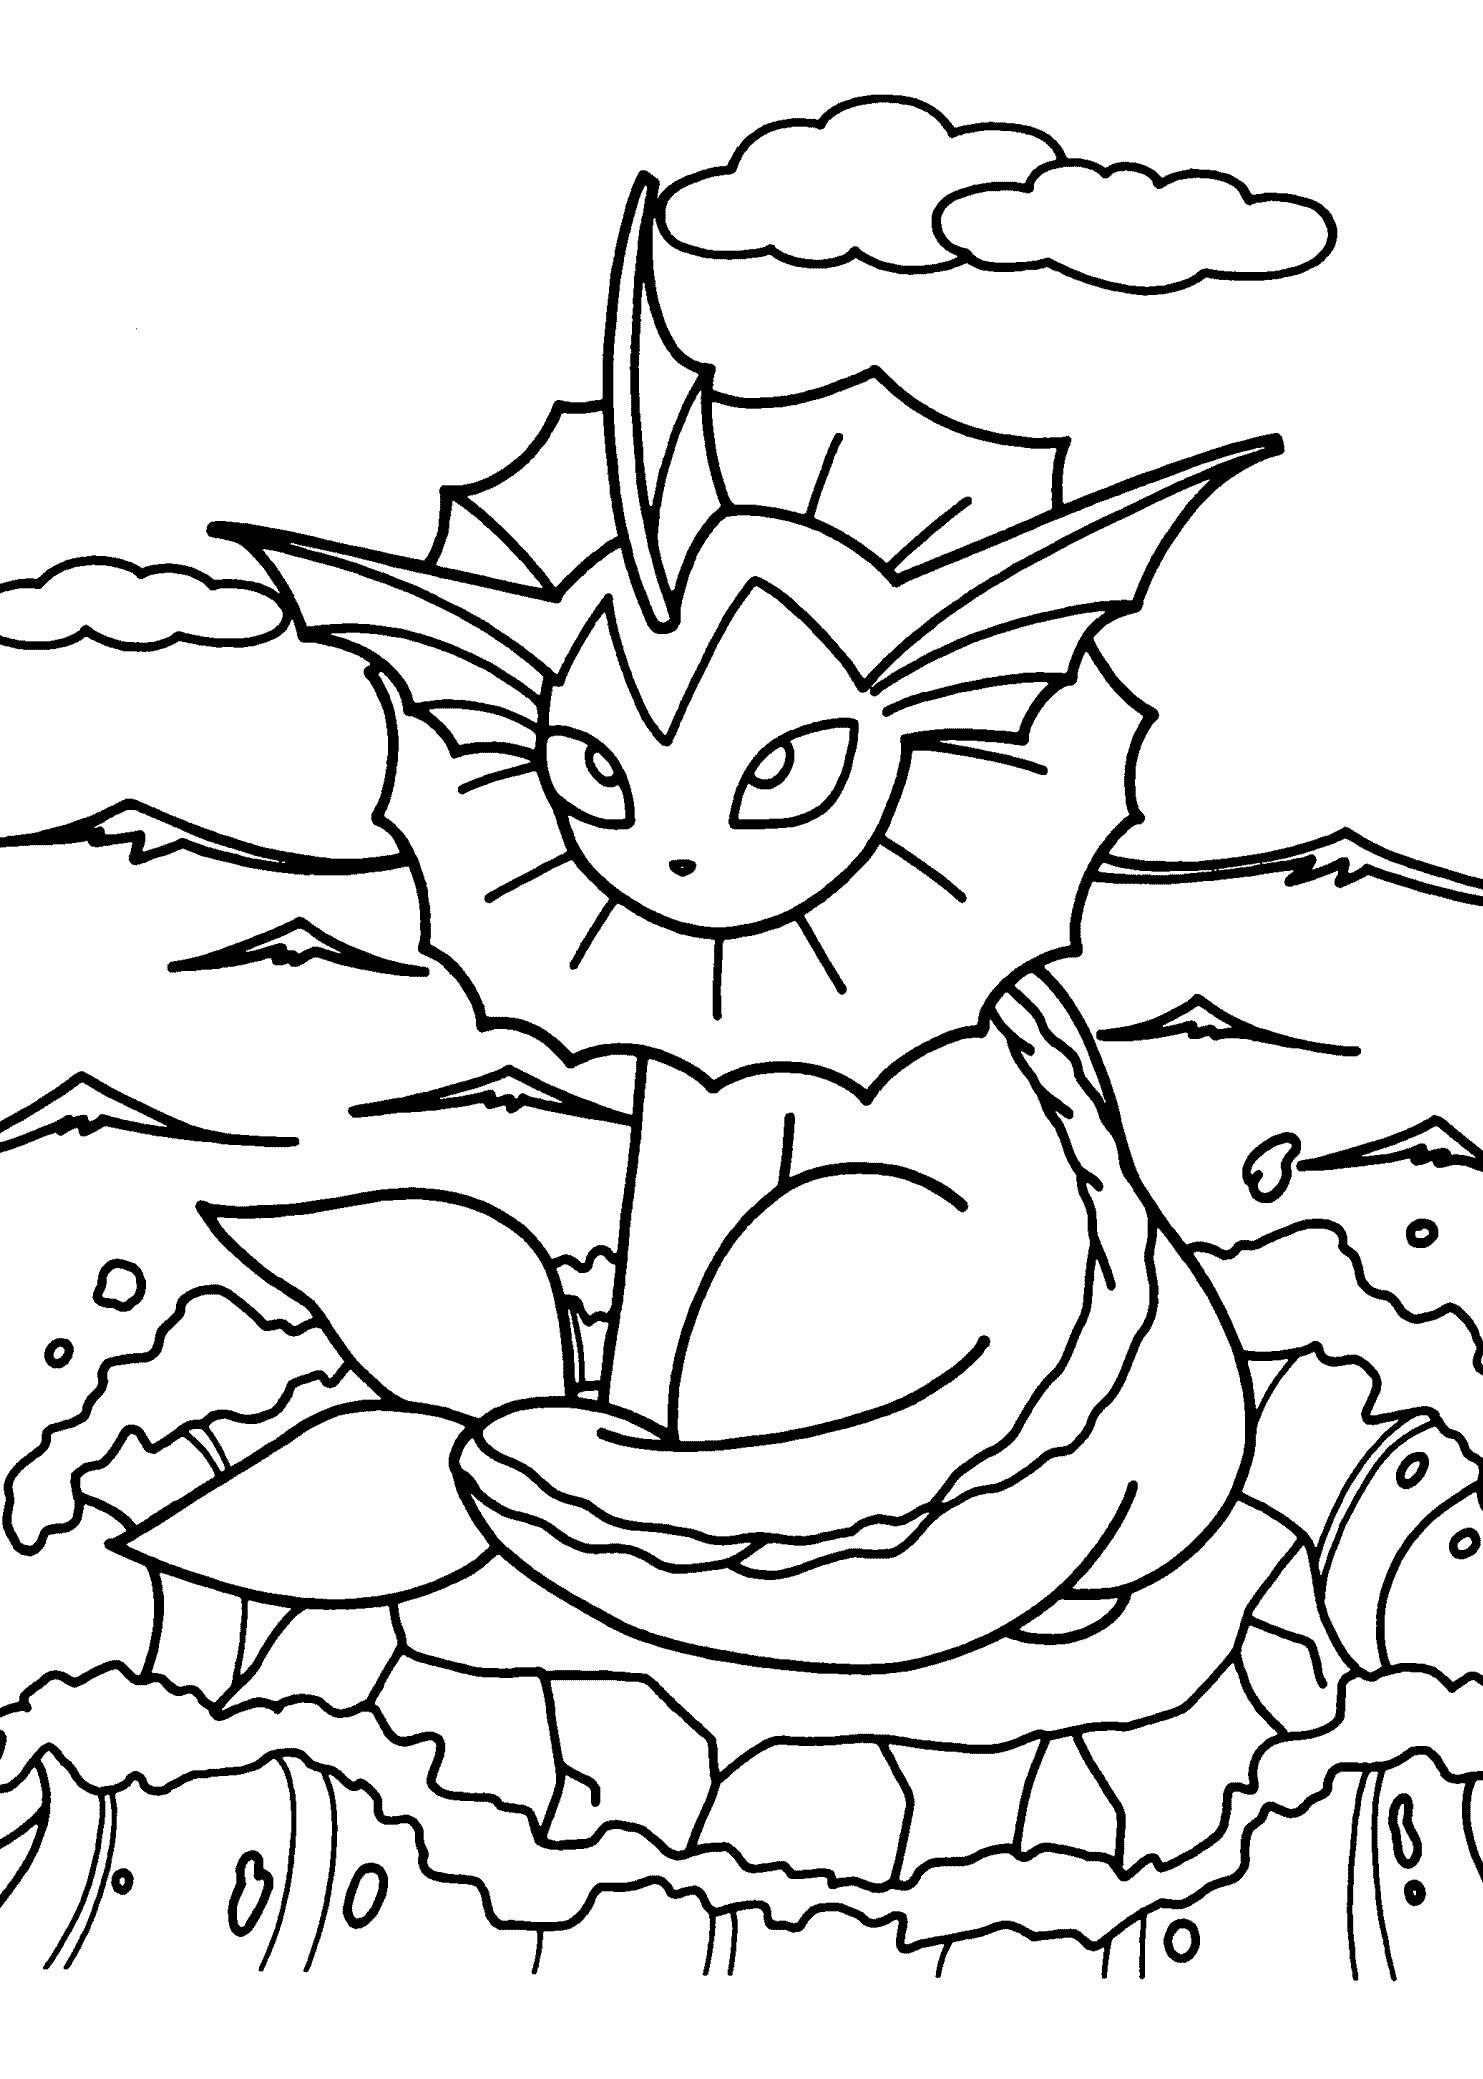 Ausmalbilder Pokemon Xy Genial 28 Pixelmon Coloring Pages Sammlung